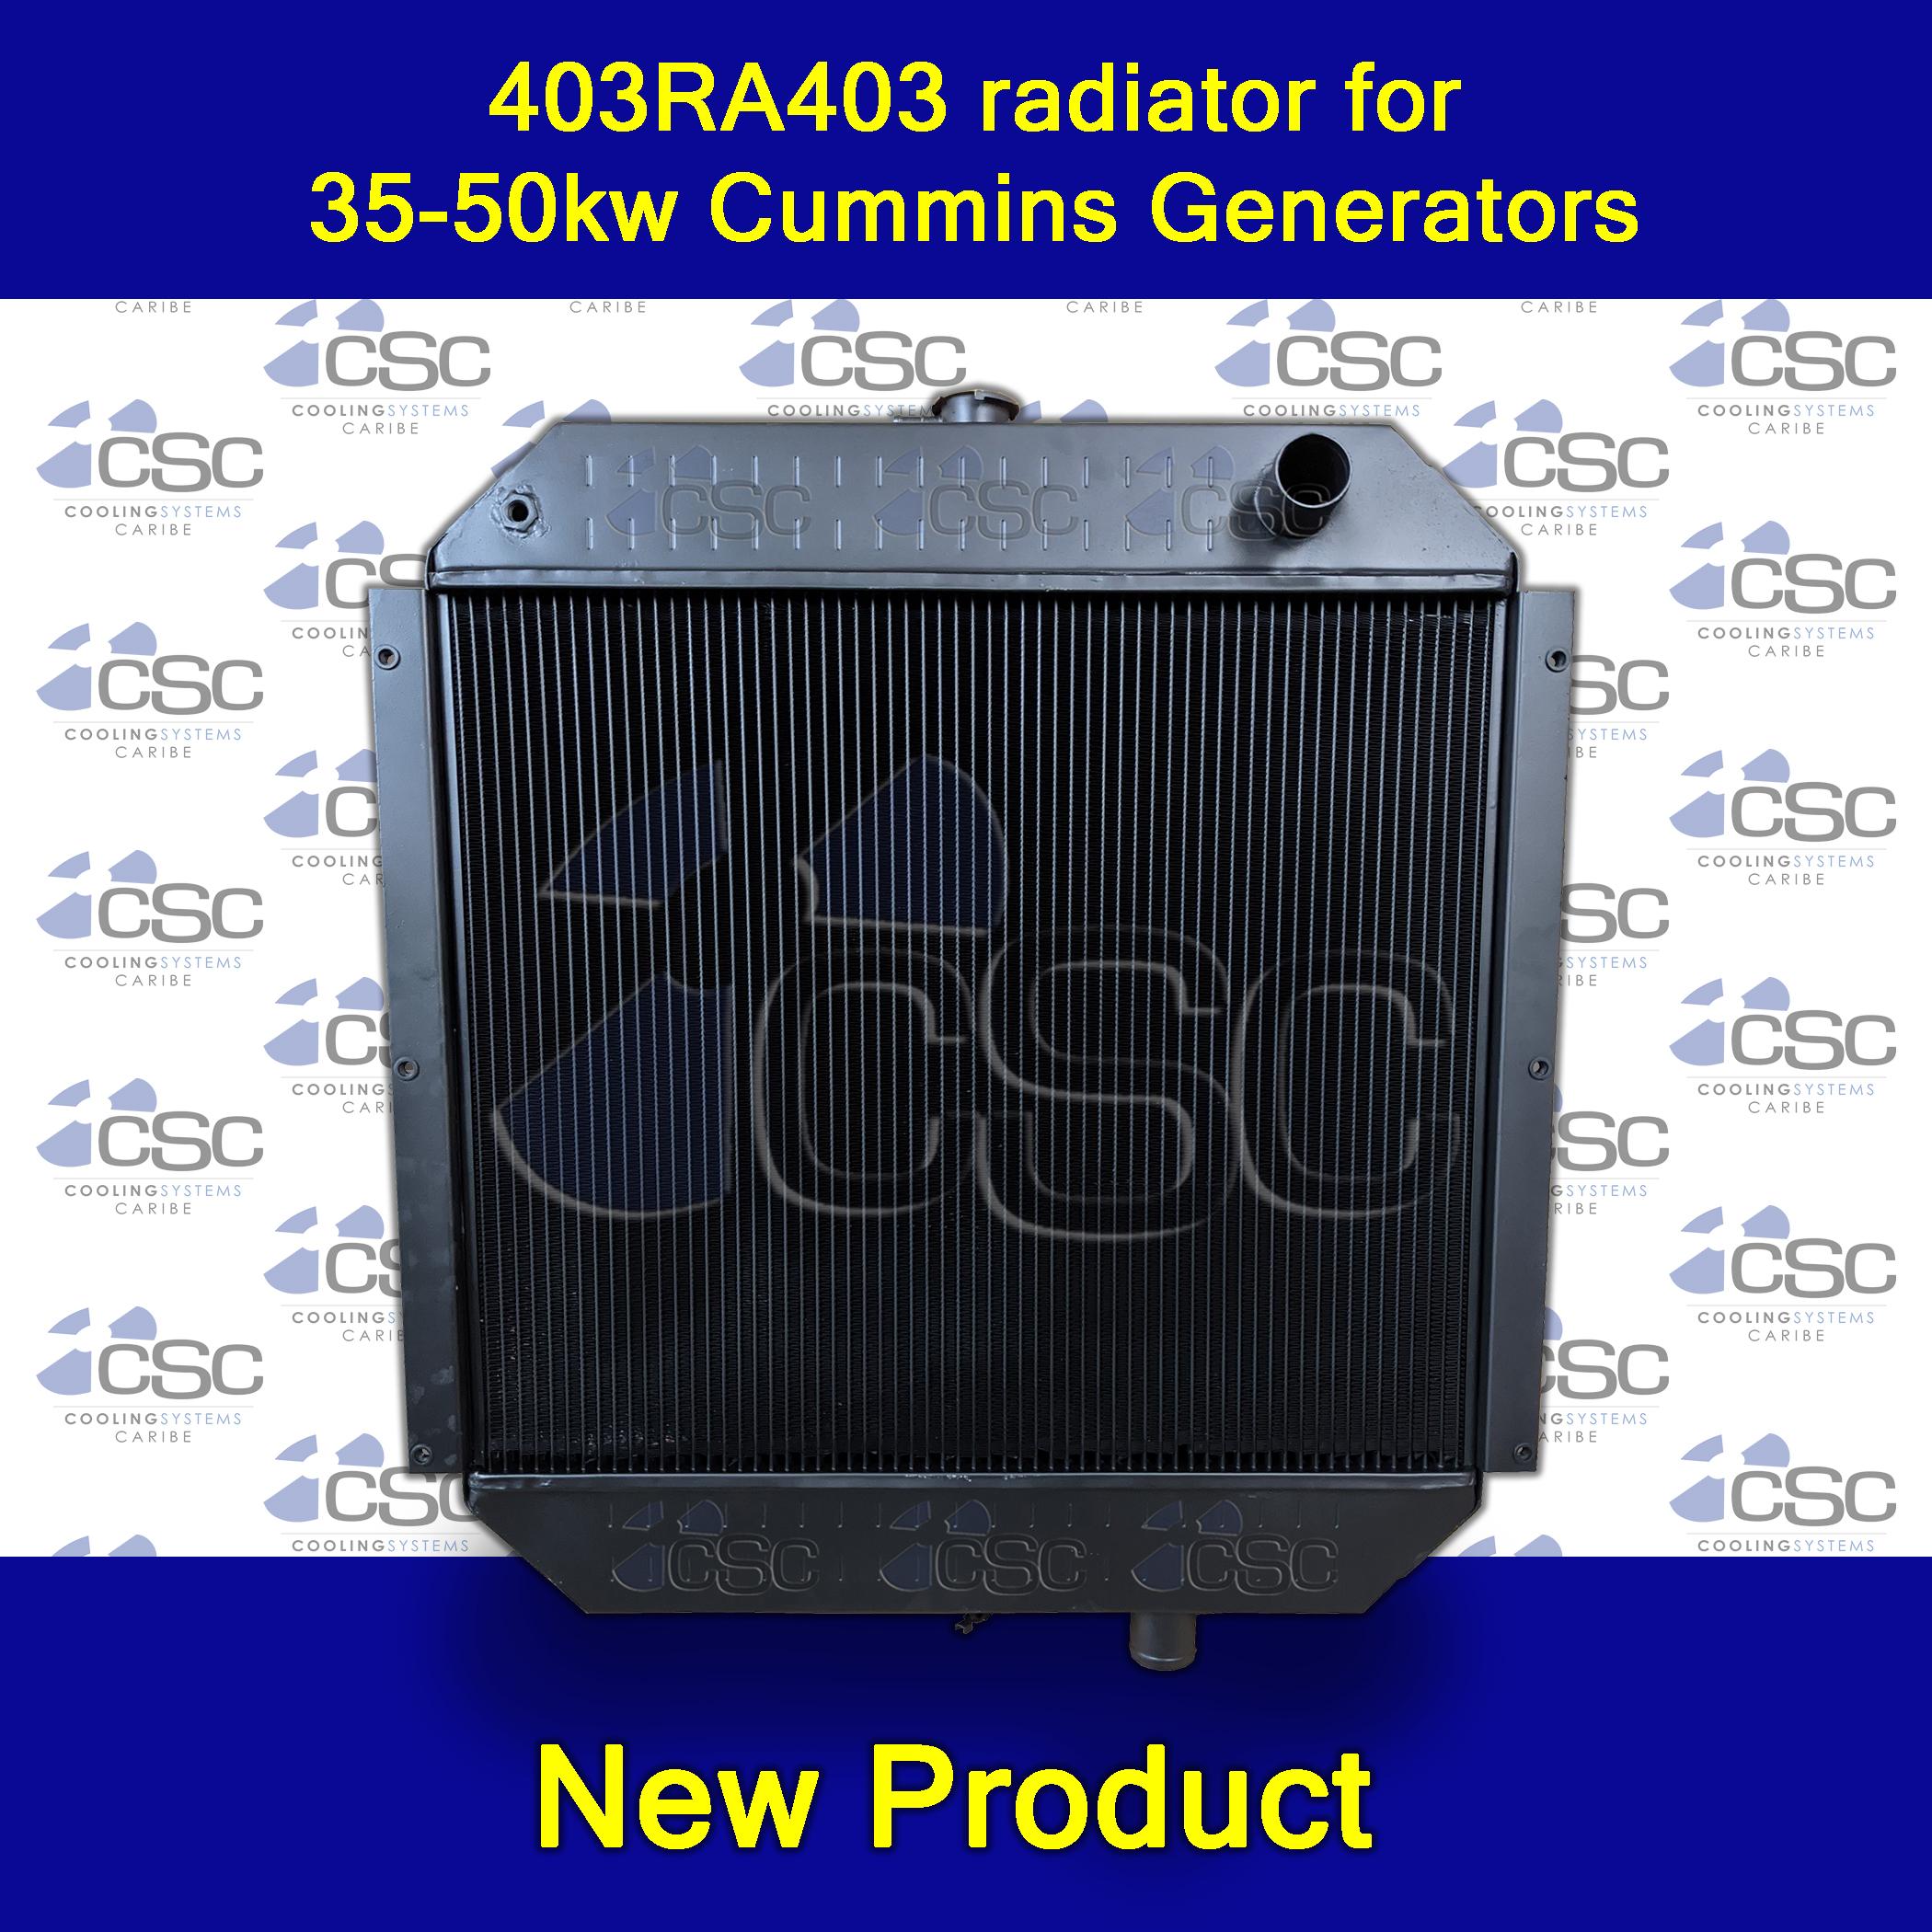 Now in stock! 403RA403 radiator for 35-50kw Cummins Generators